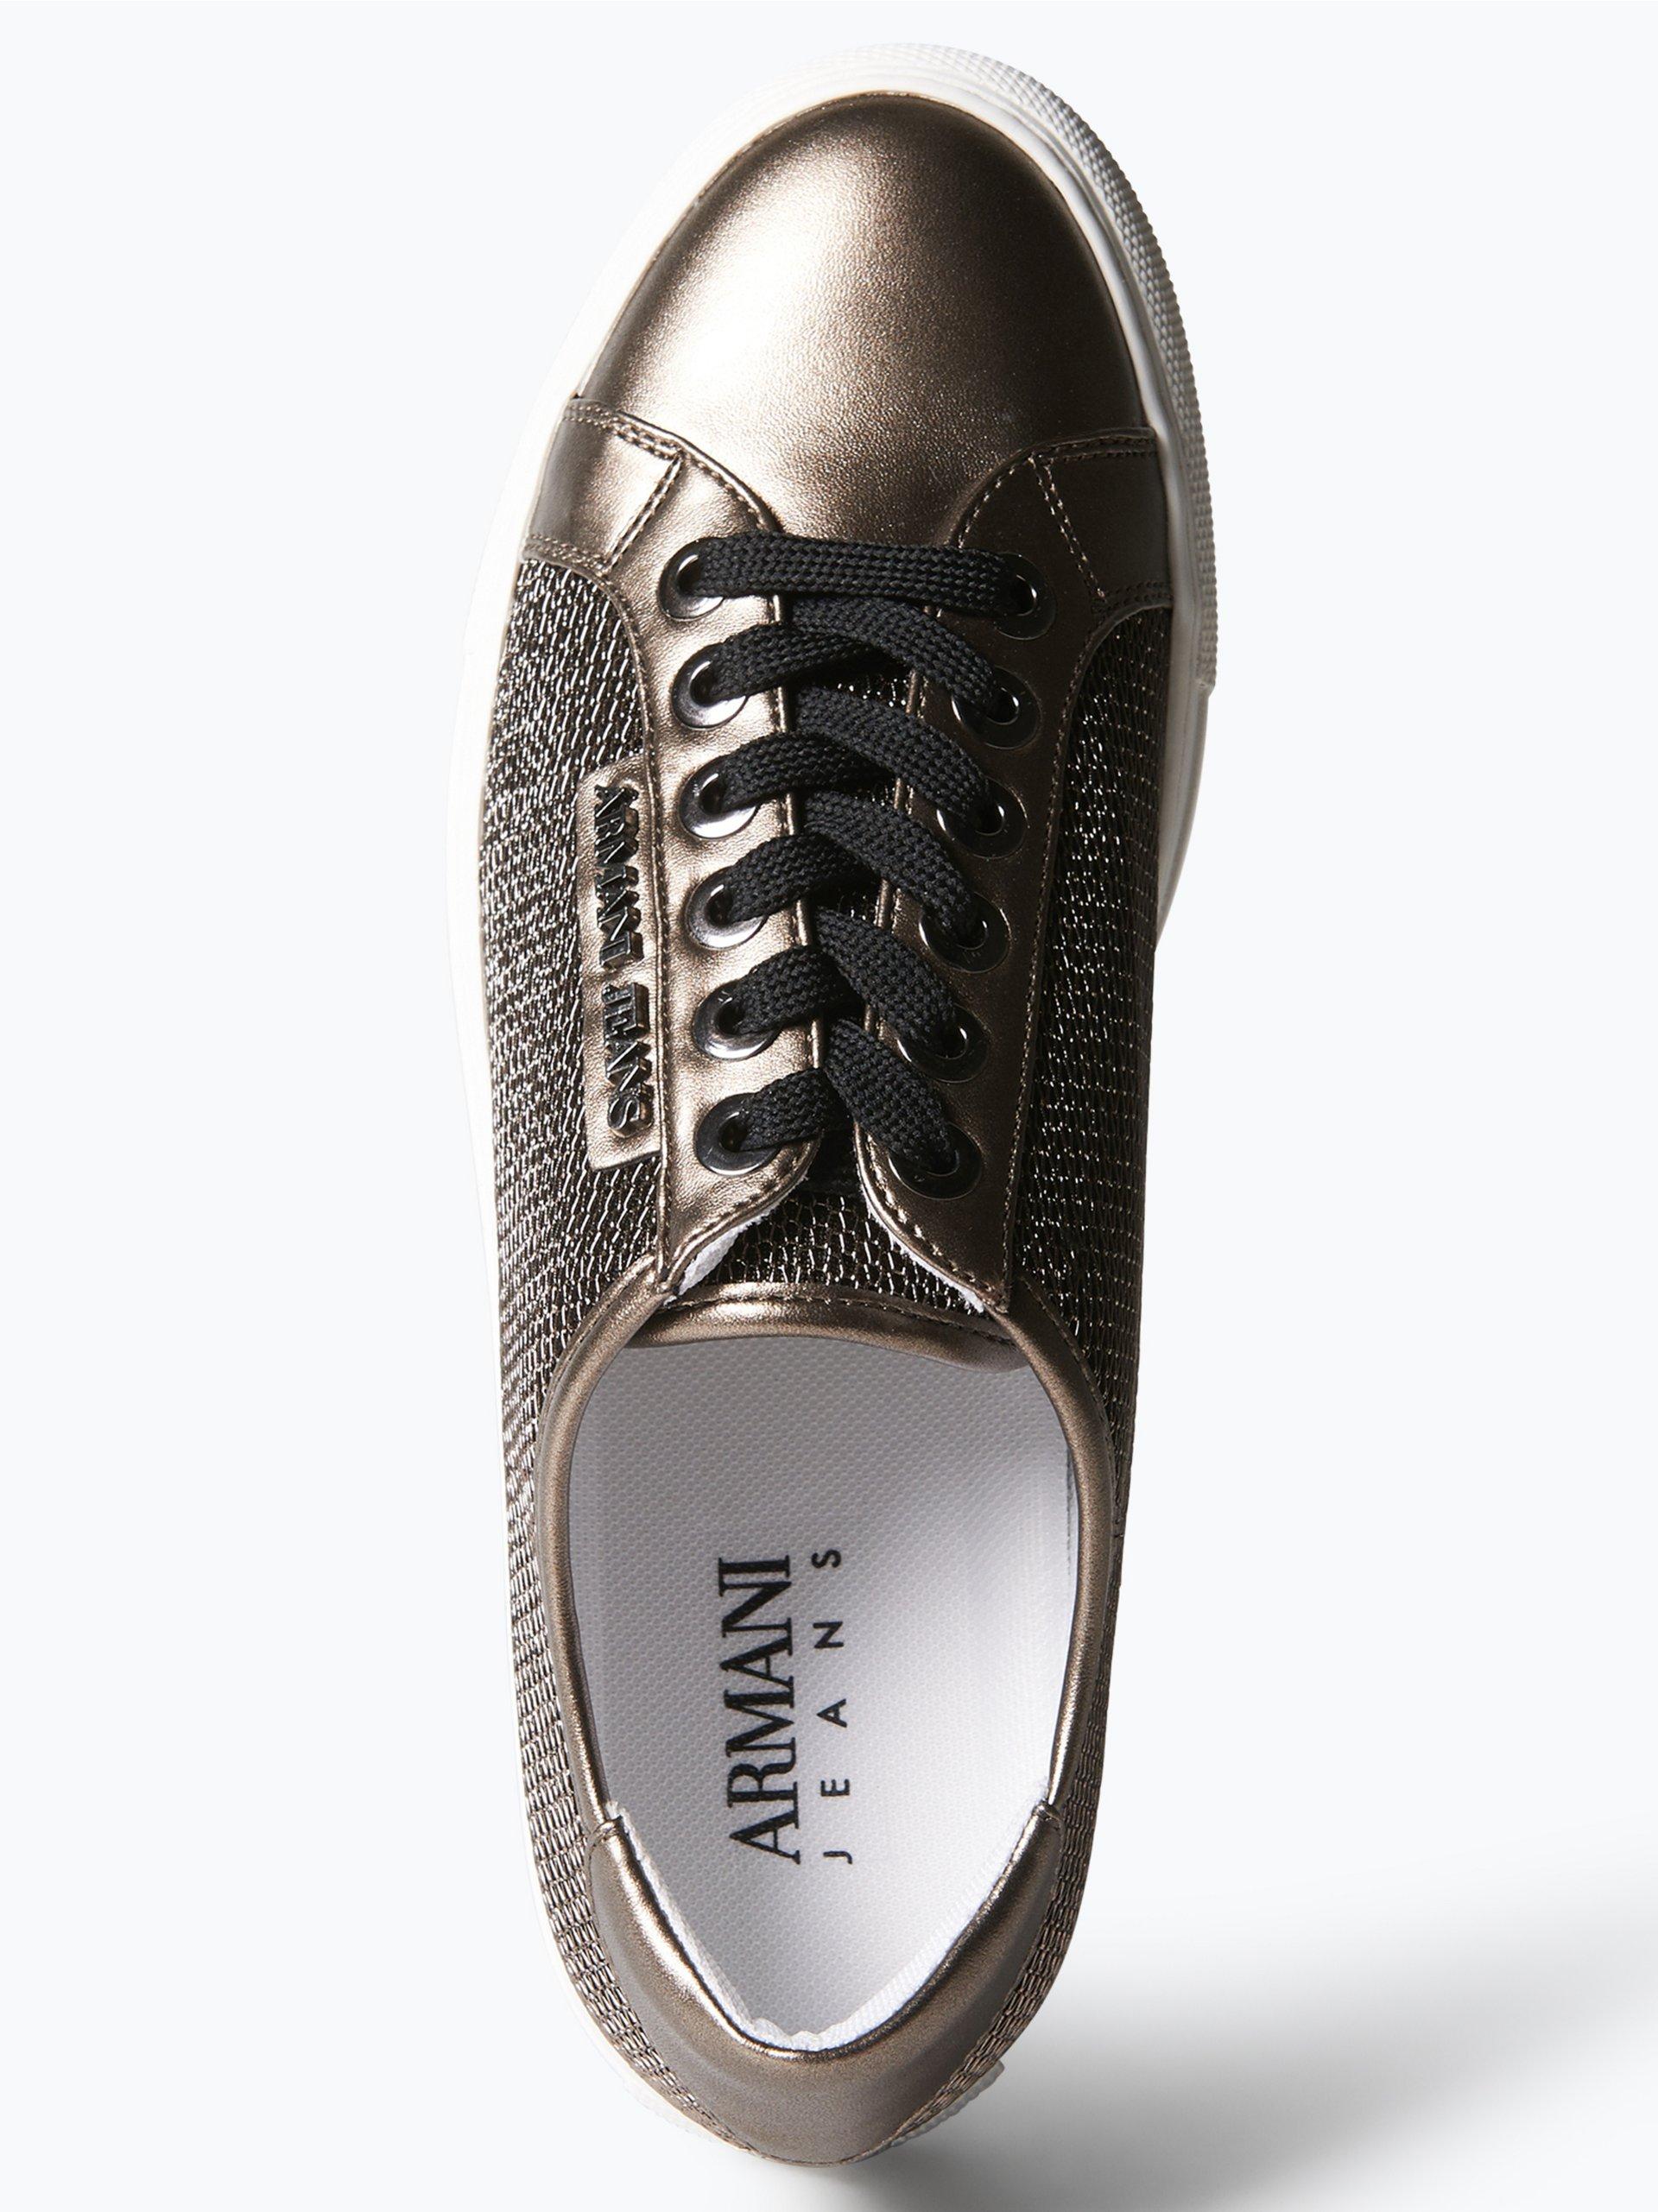 armani jeans damen sneaker gold uni online kaufen. Black Bedroom Furniture Sets. Home Design Ideas